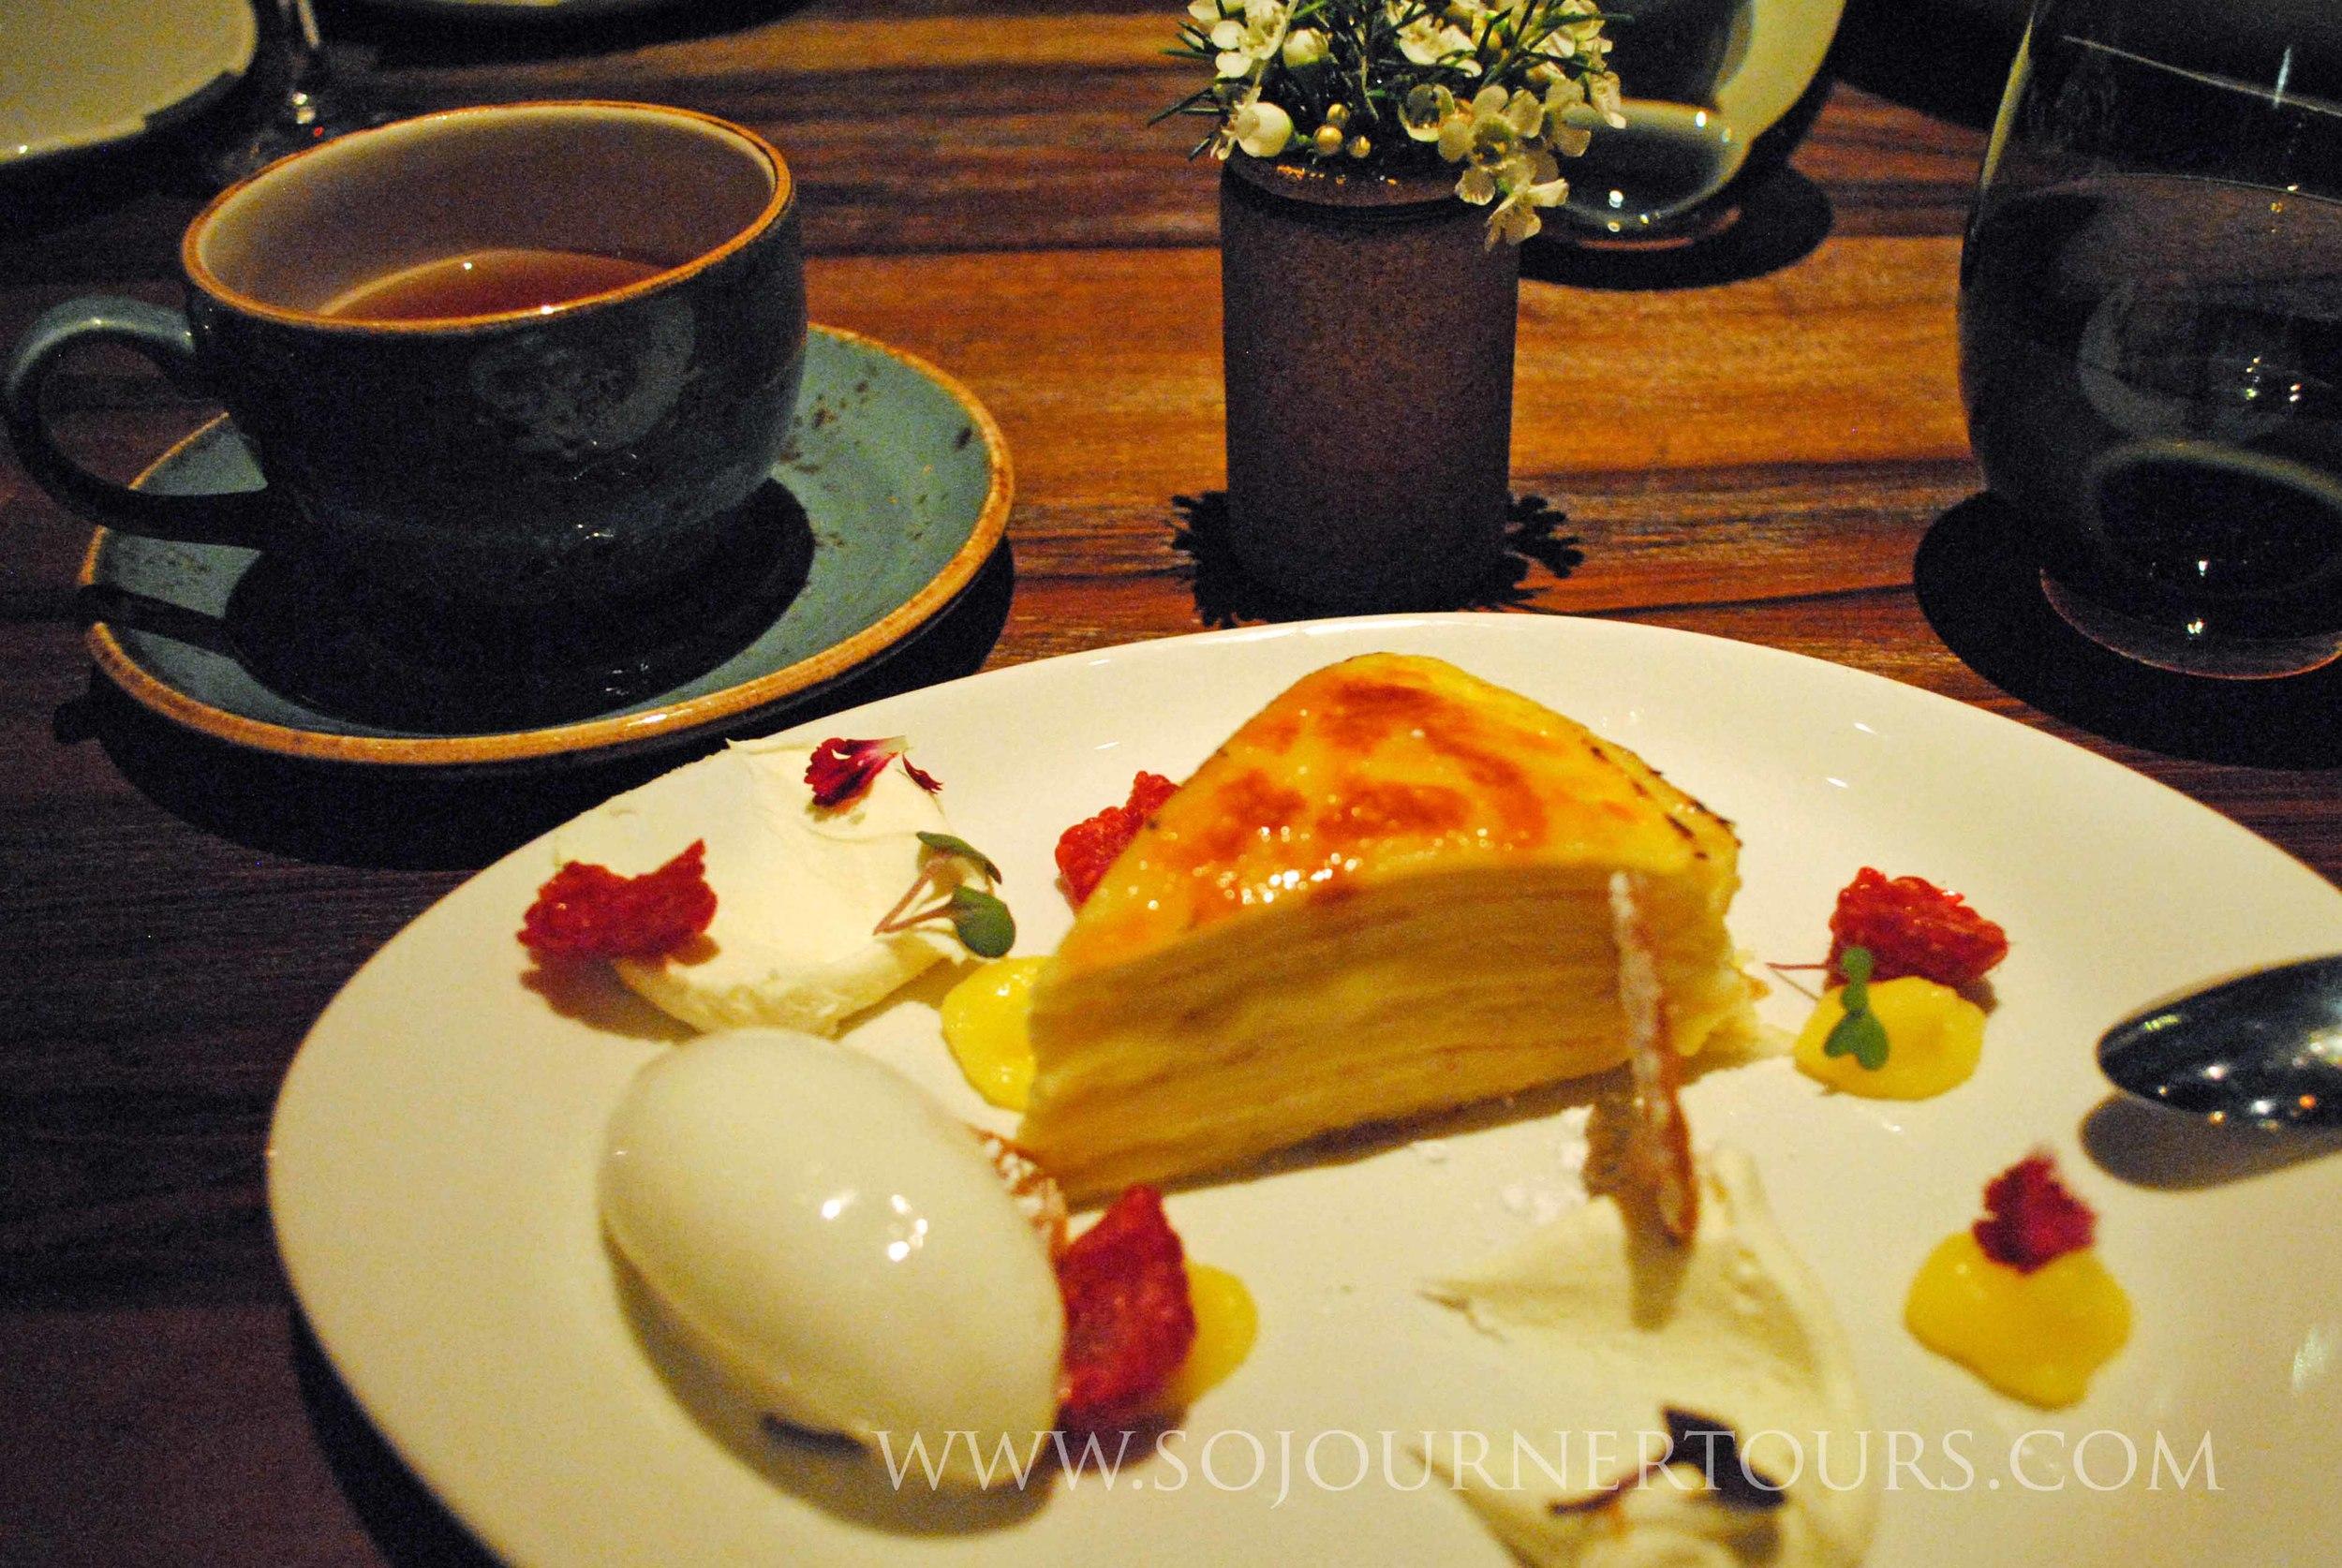 Dessert: Austin Food Tour